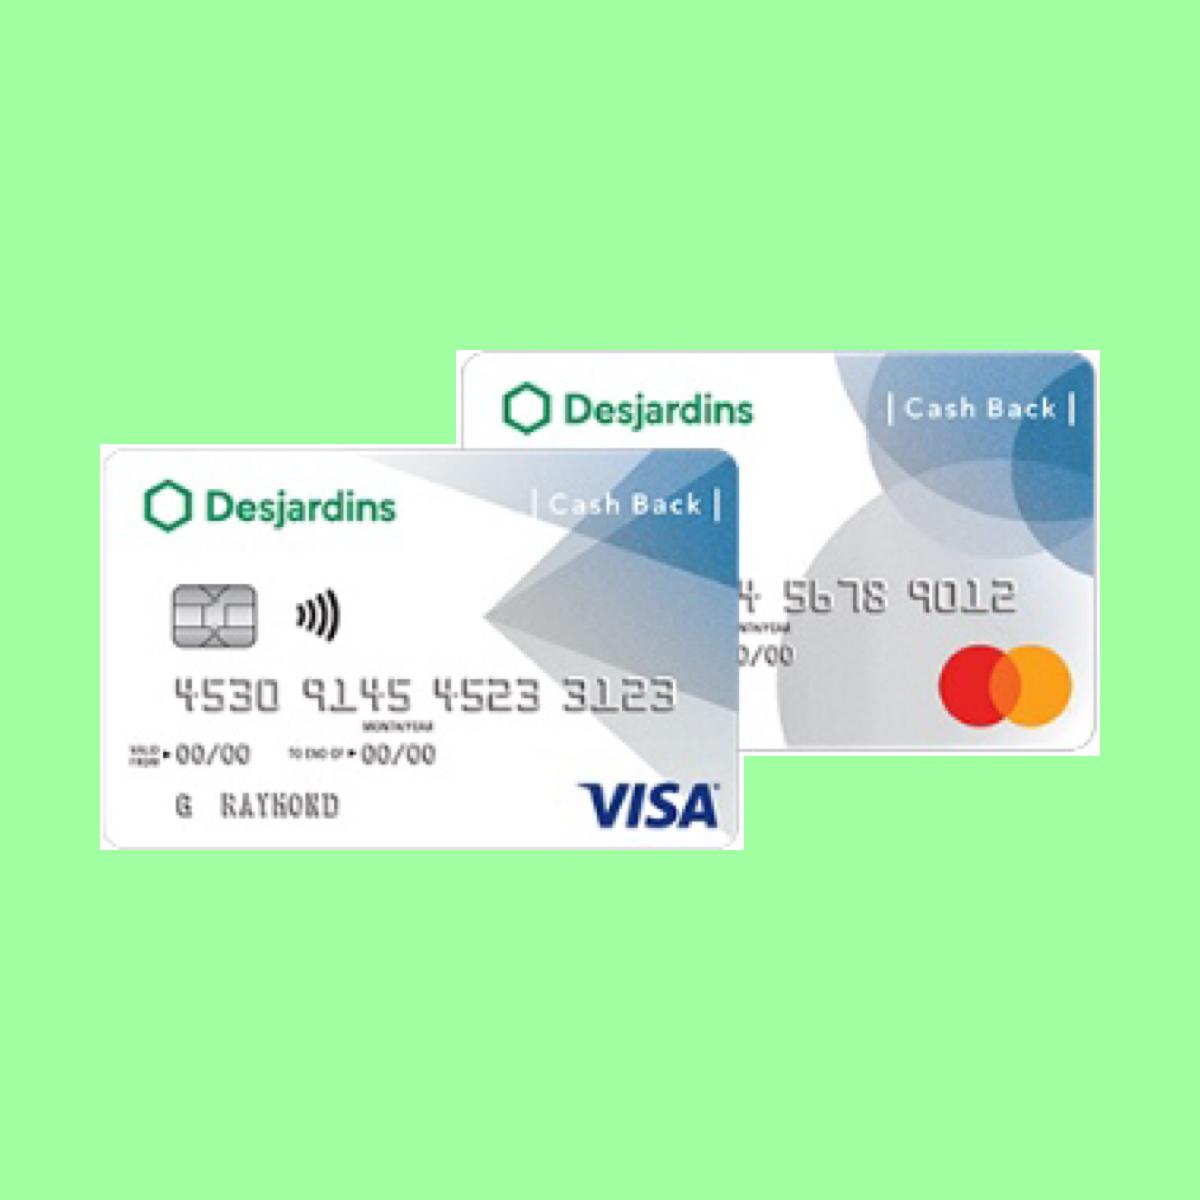 Desjardins Cash Back Visa Mastercard The Point Calculator Cash Reward Card Health Care Coverage